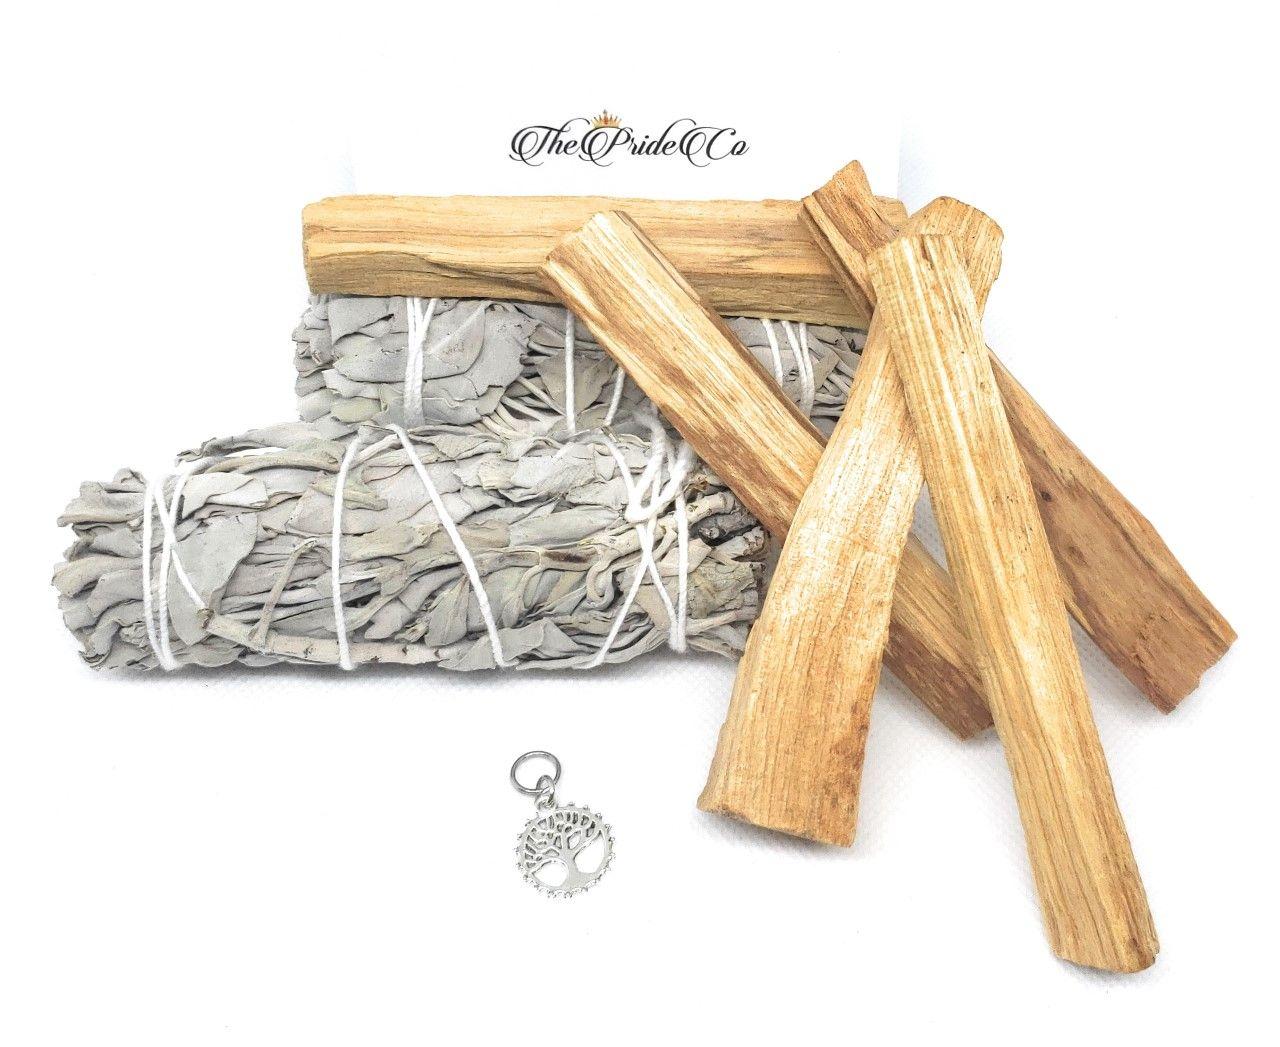 California White Sage and Palo Santo Stick/Wood. Used to